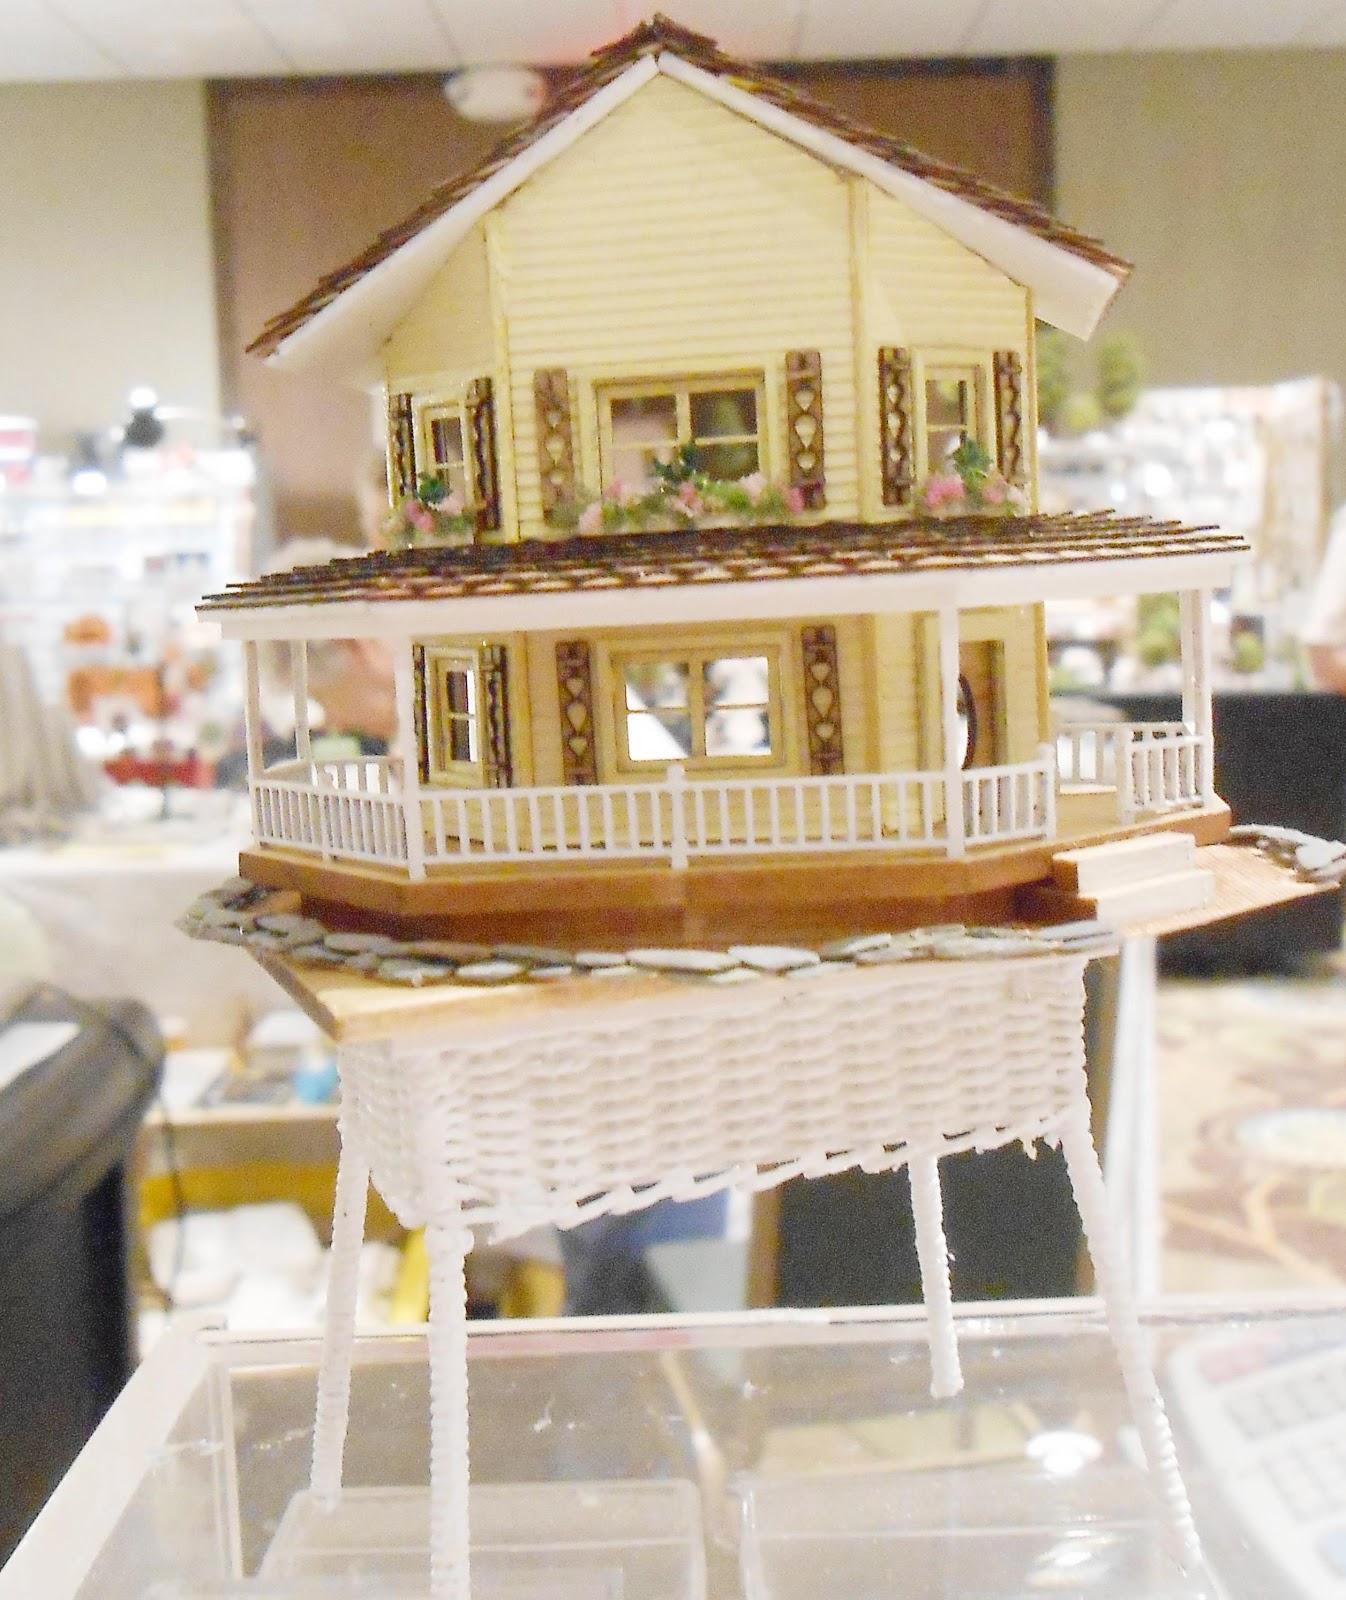 Honey, I Shrunk The House!: Mini Show Finds / Visit With Keli